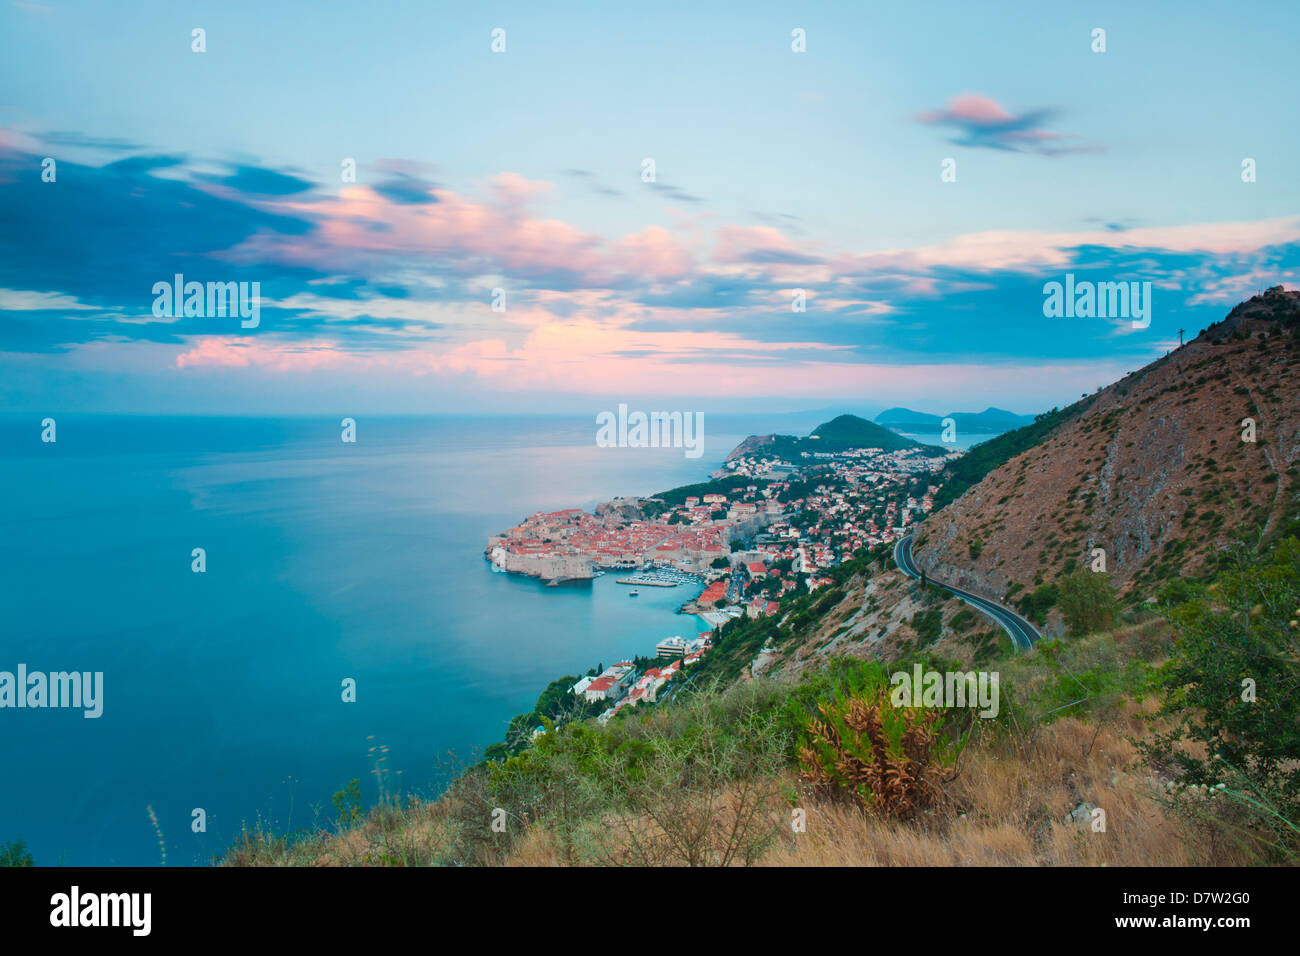 Dubrovnik Old Town and Mount Srd at sunrise, Dalmatian Coast, Adriatic, Croatia - Stock Image